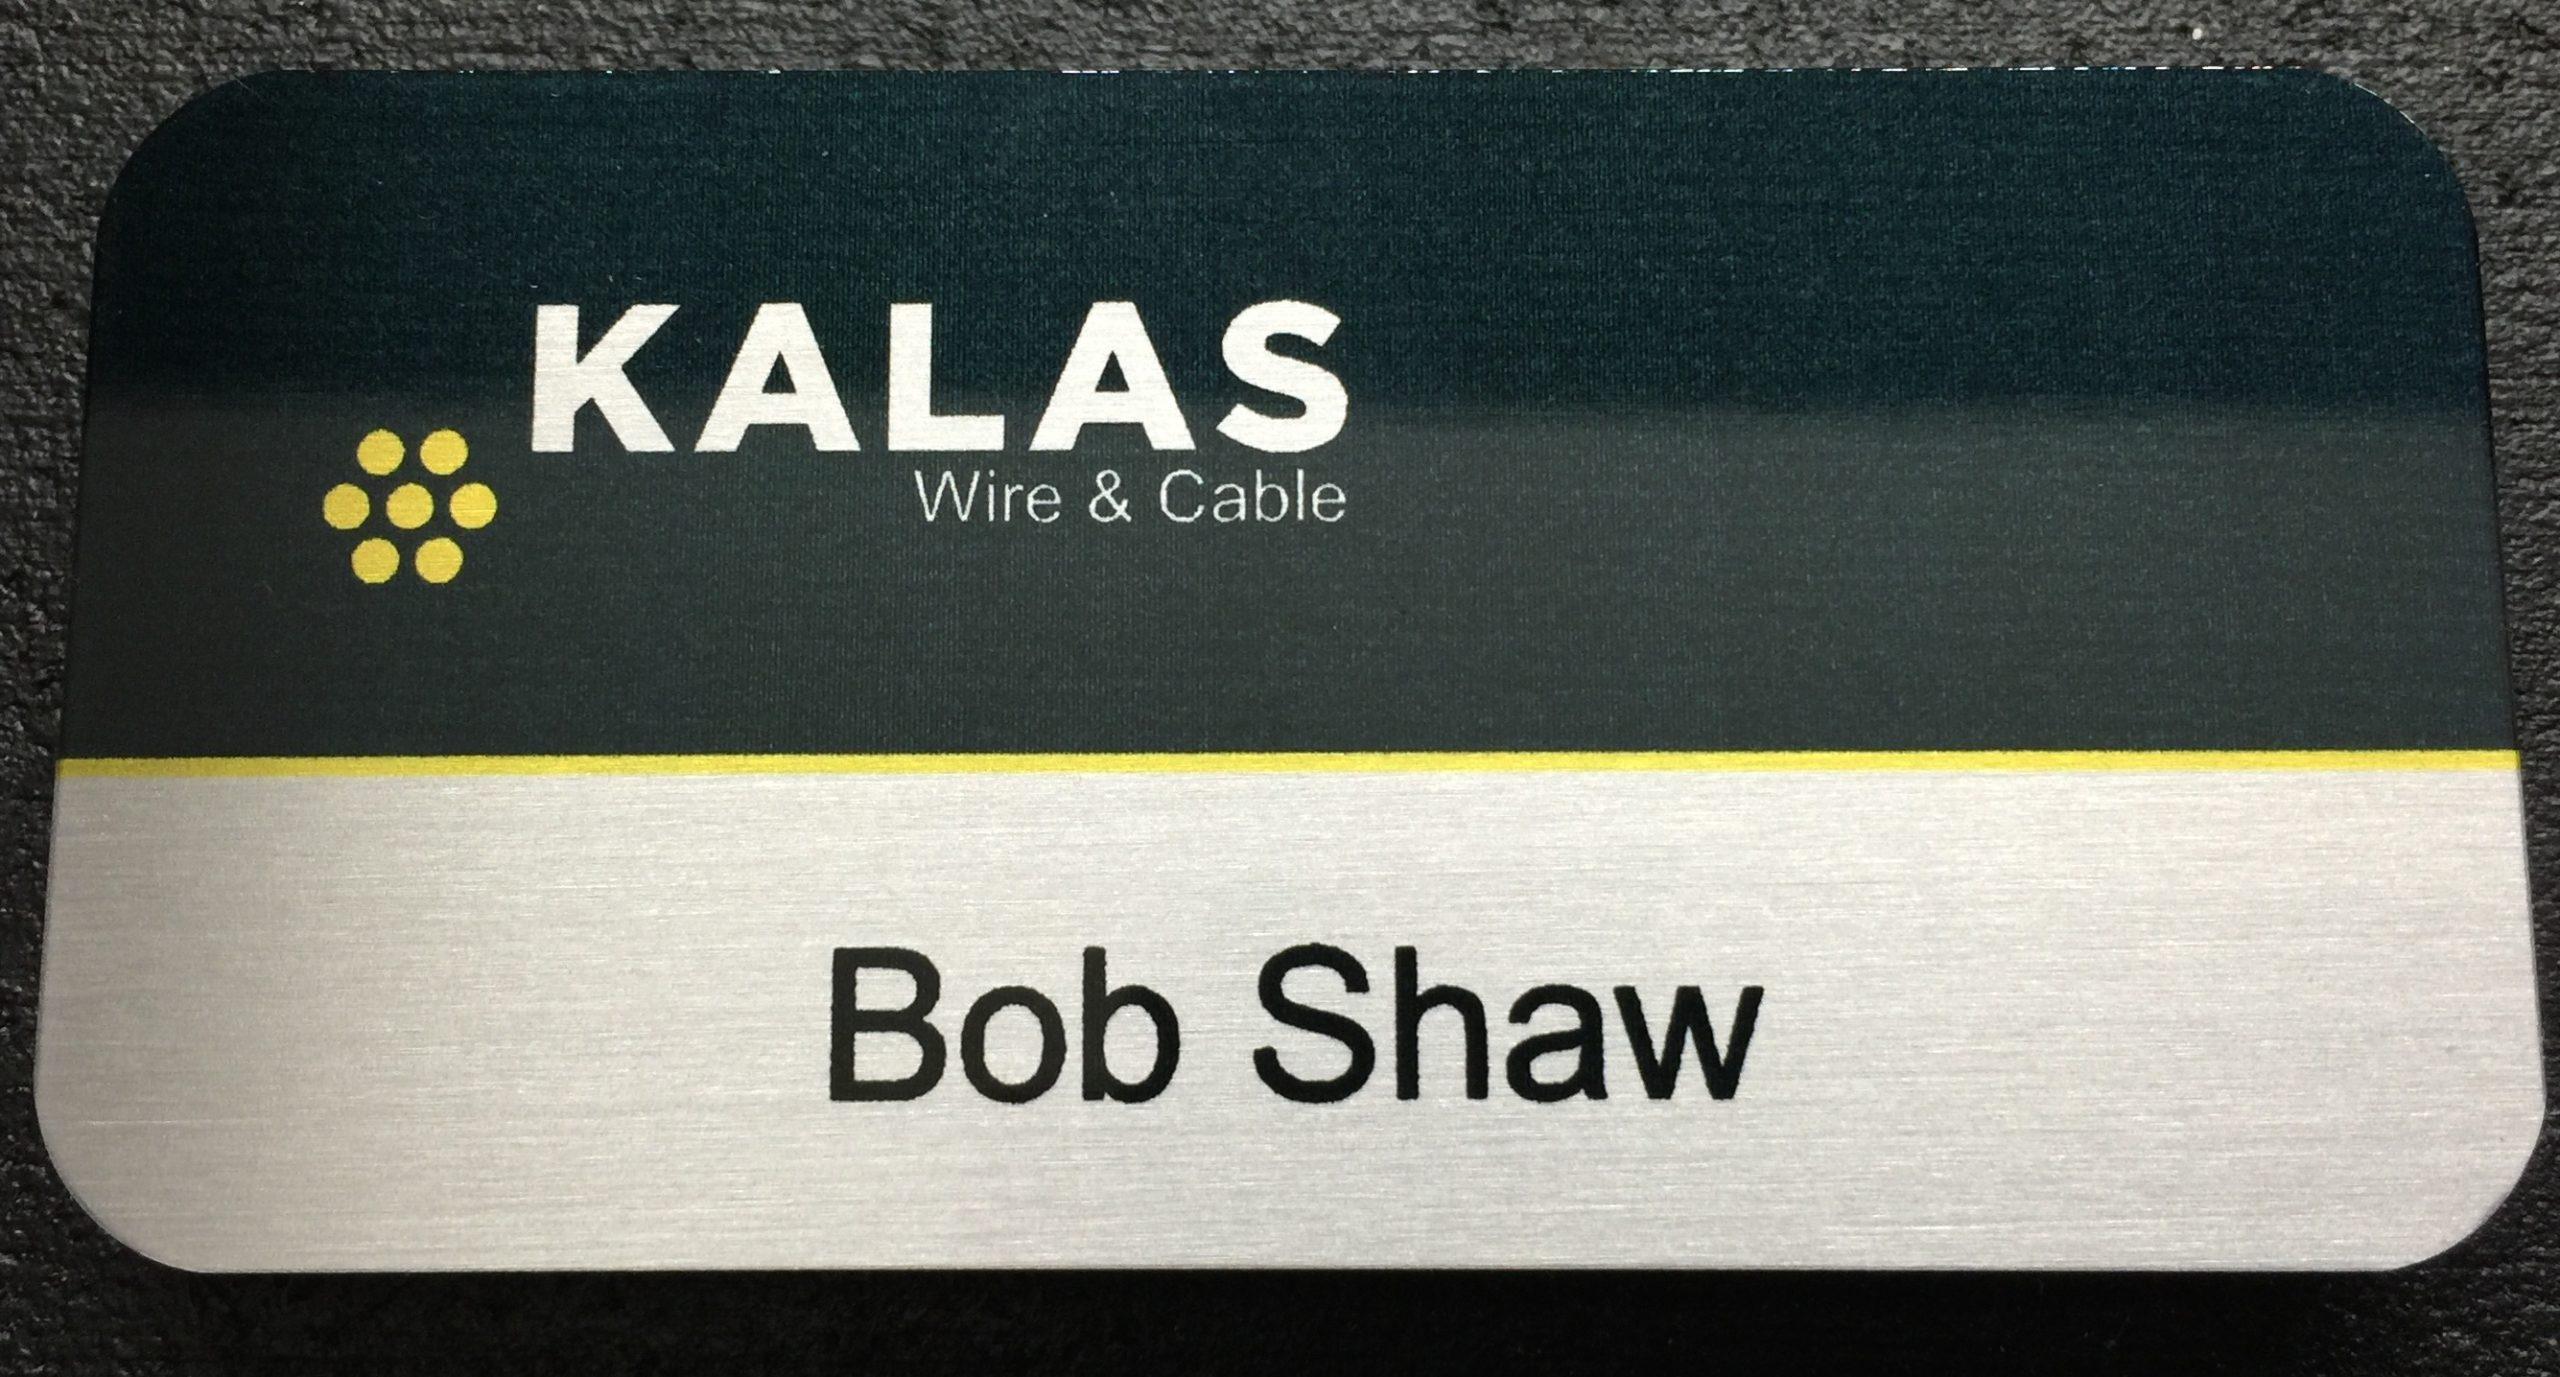 KALAS Wire